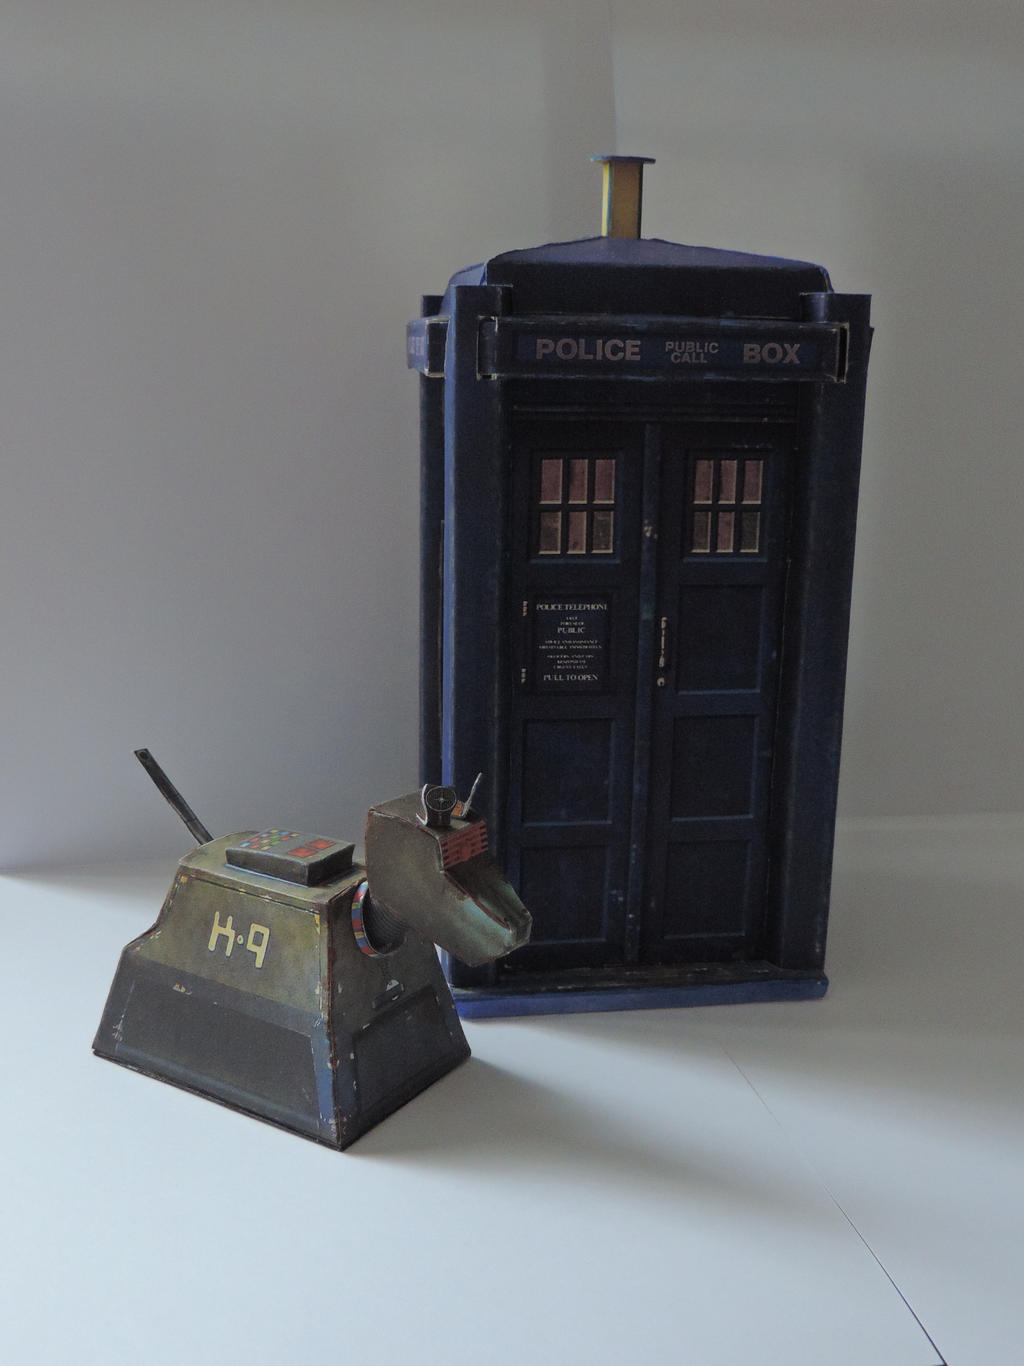 K-9 and THE TARDIS by darkmaul99